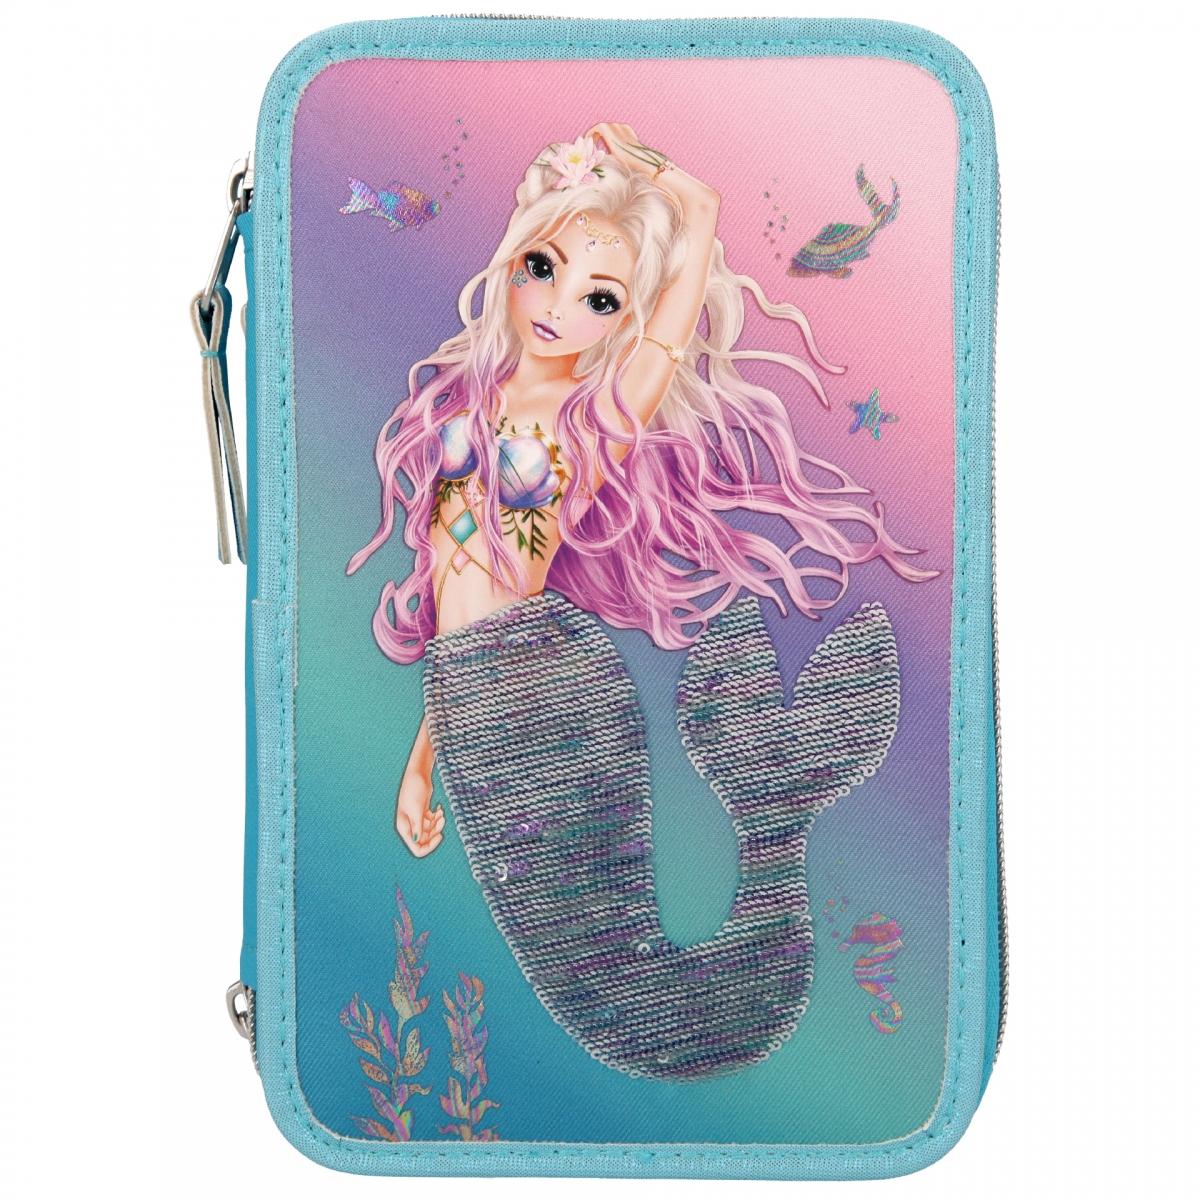 ,Fantasy model 3-vaks etui gevuld met wrijfpailletten mermaid